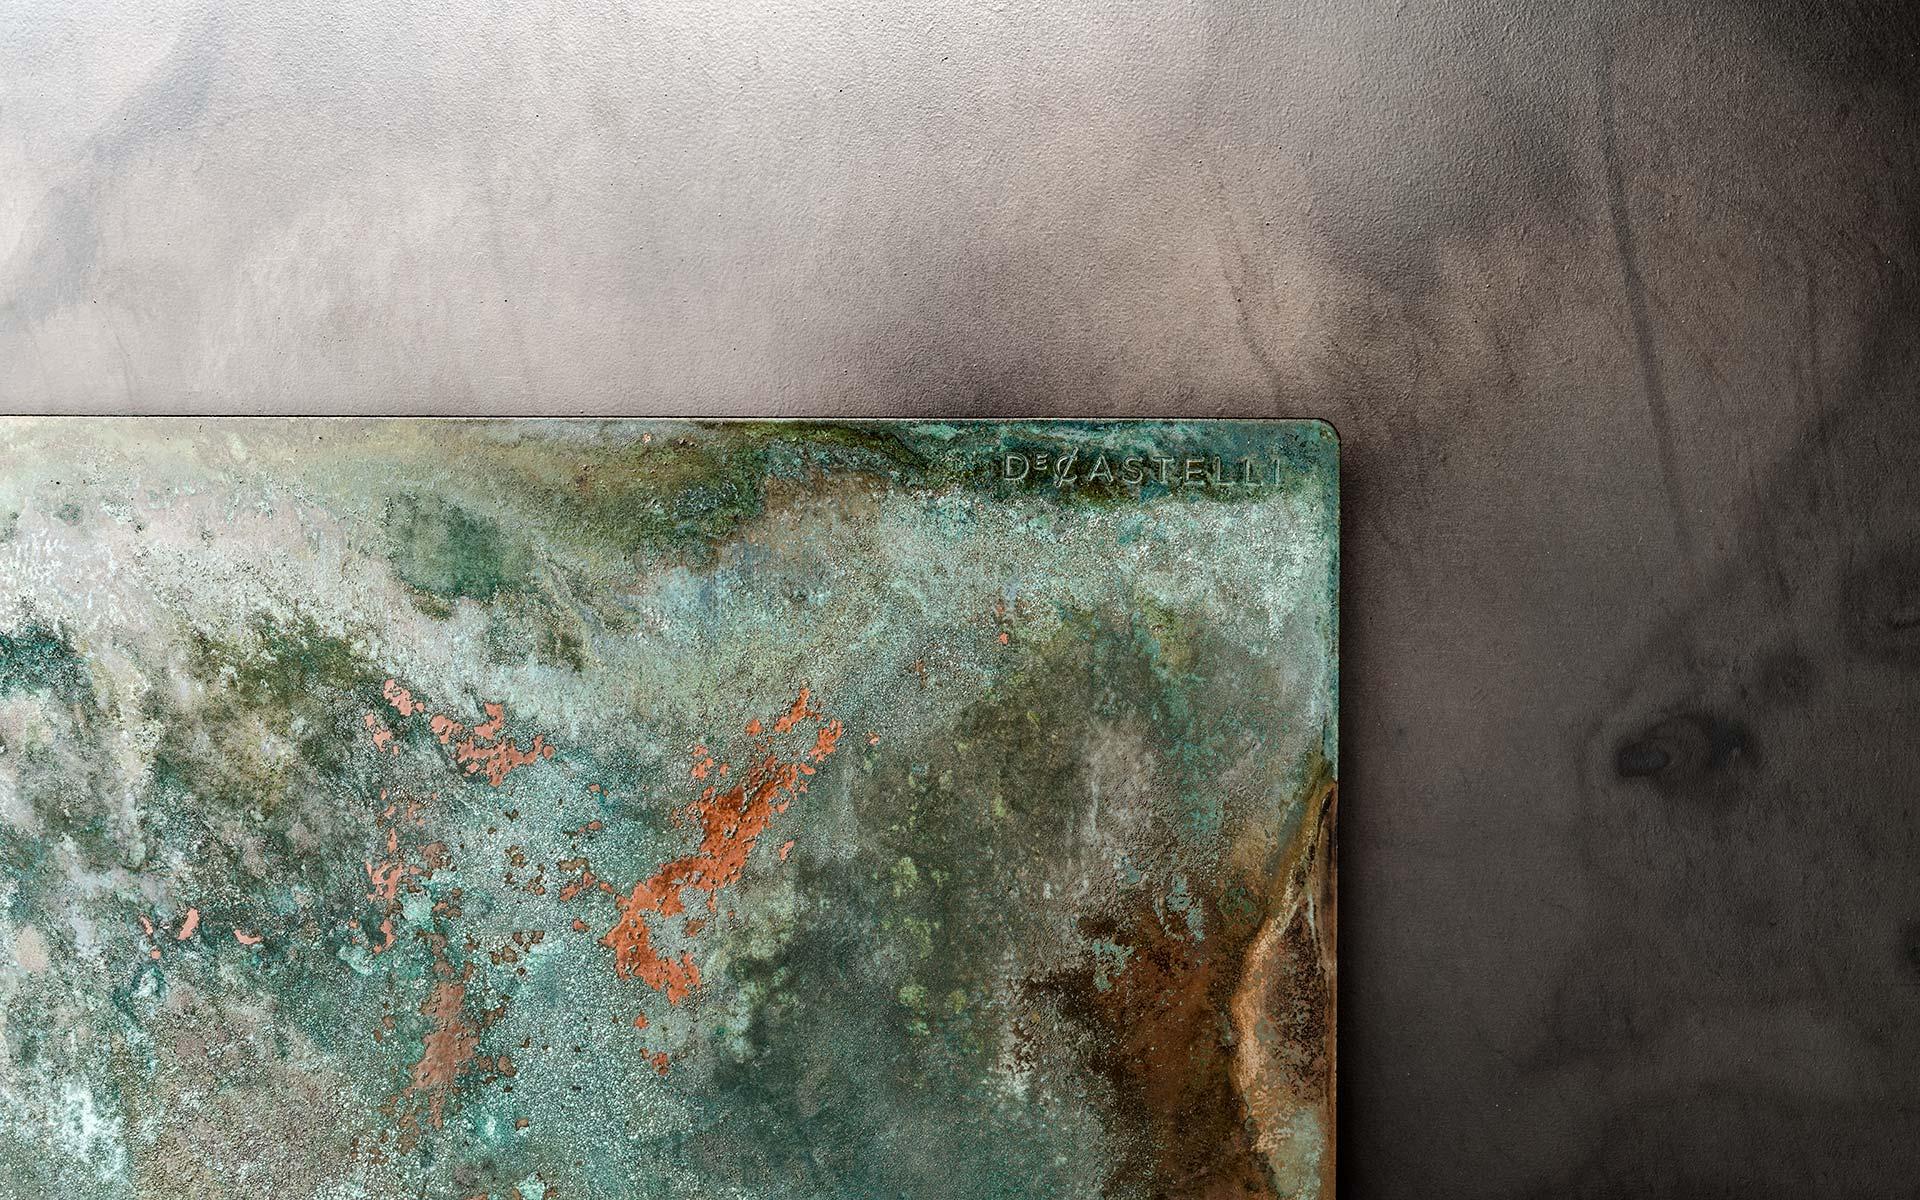 a close up of design metals and textures